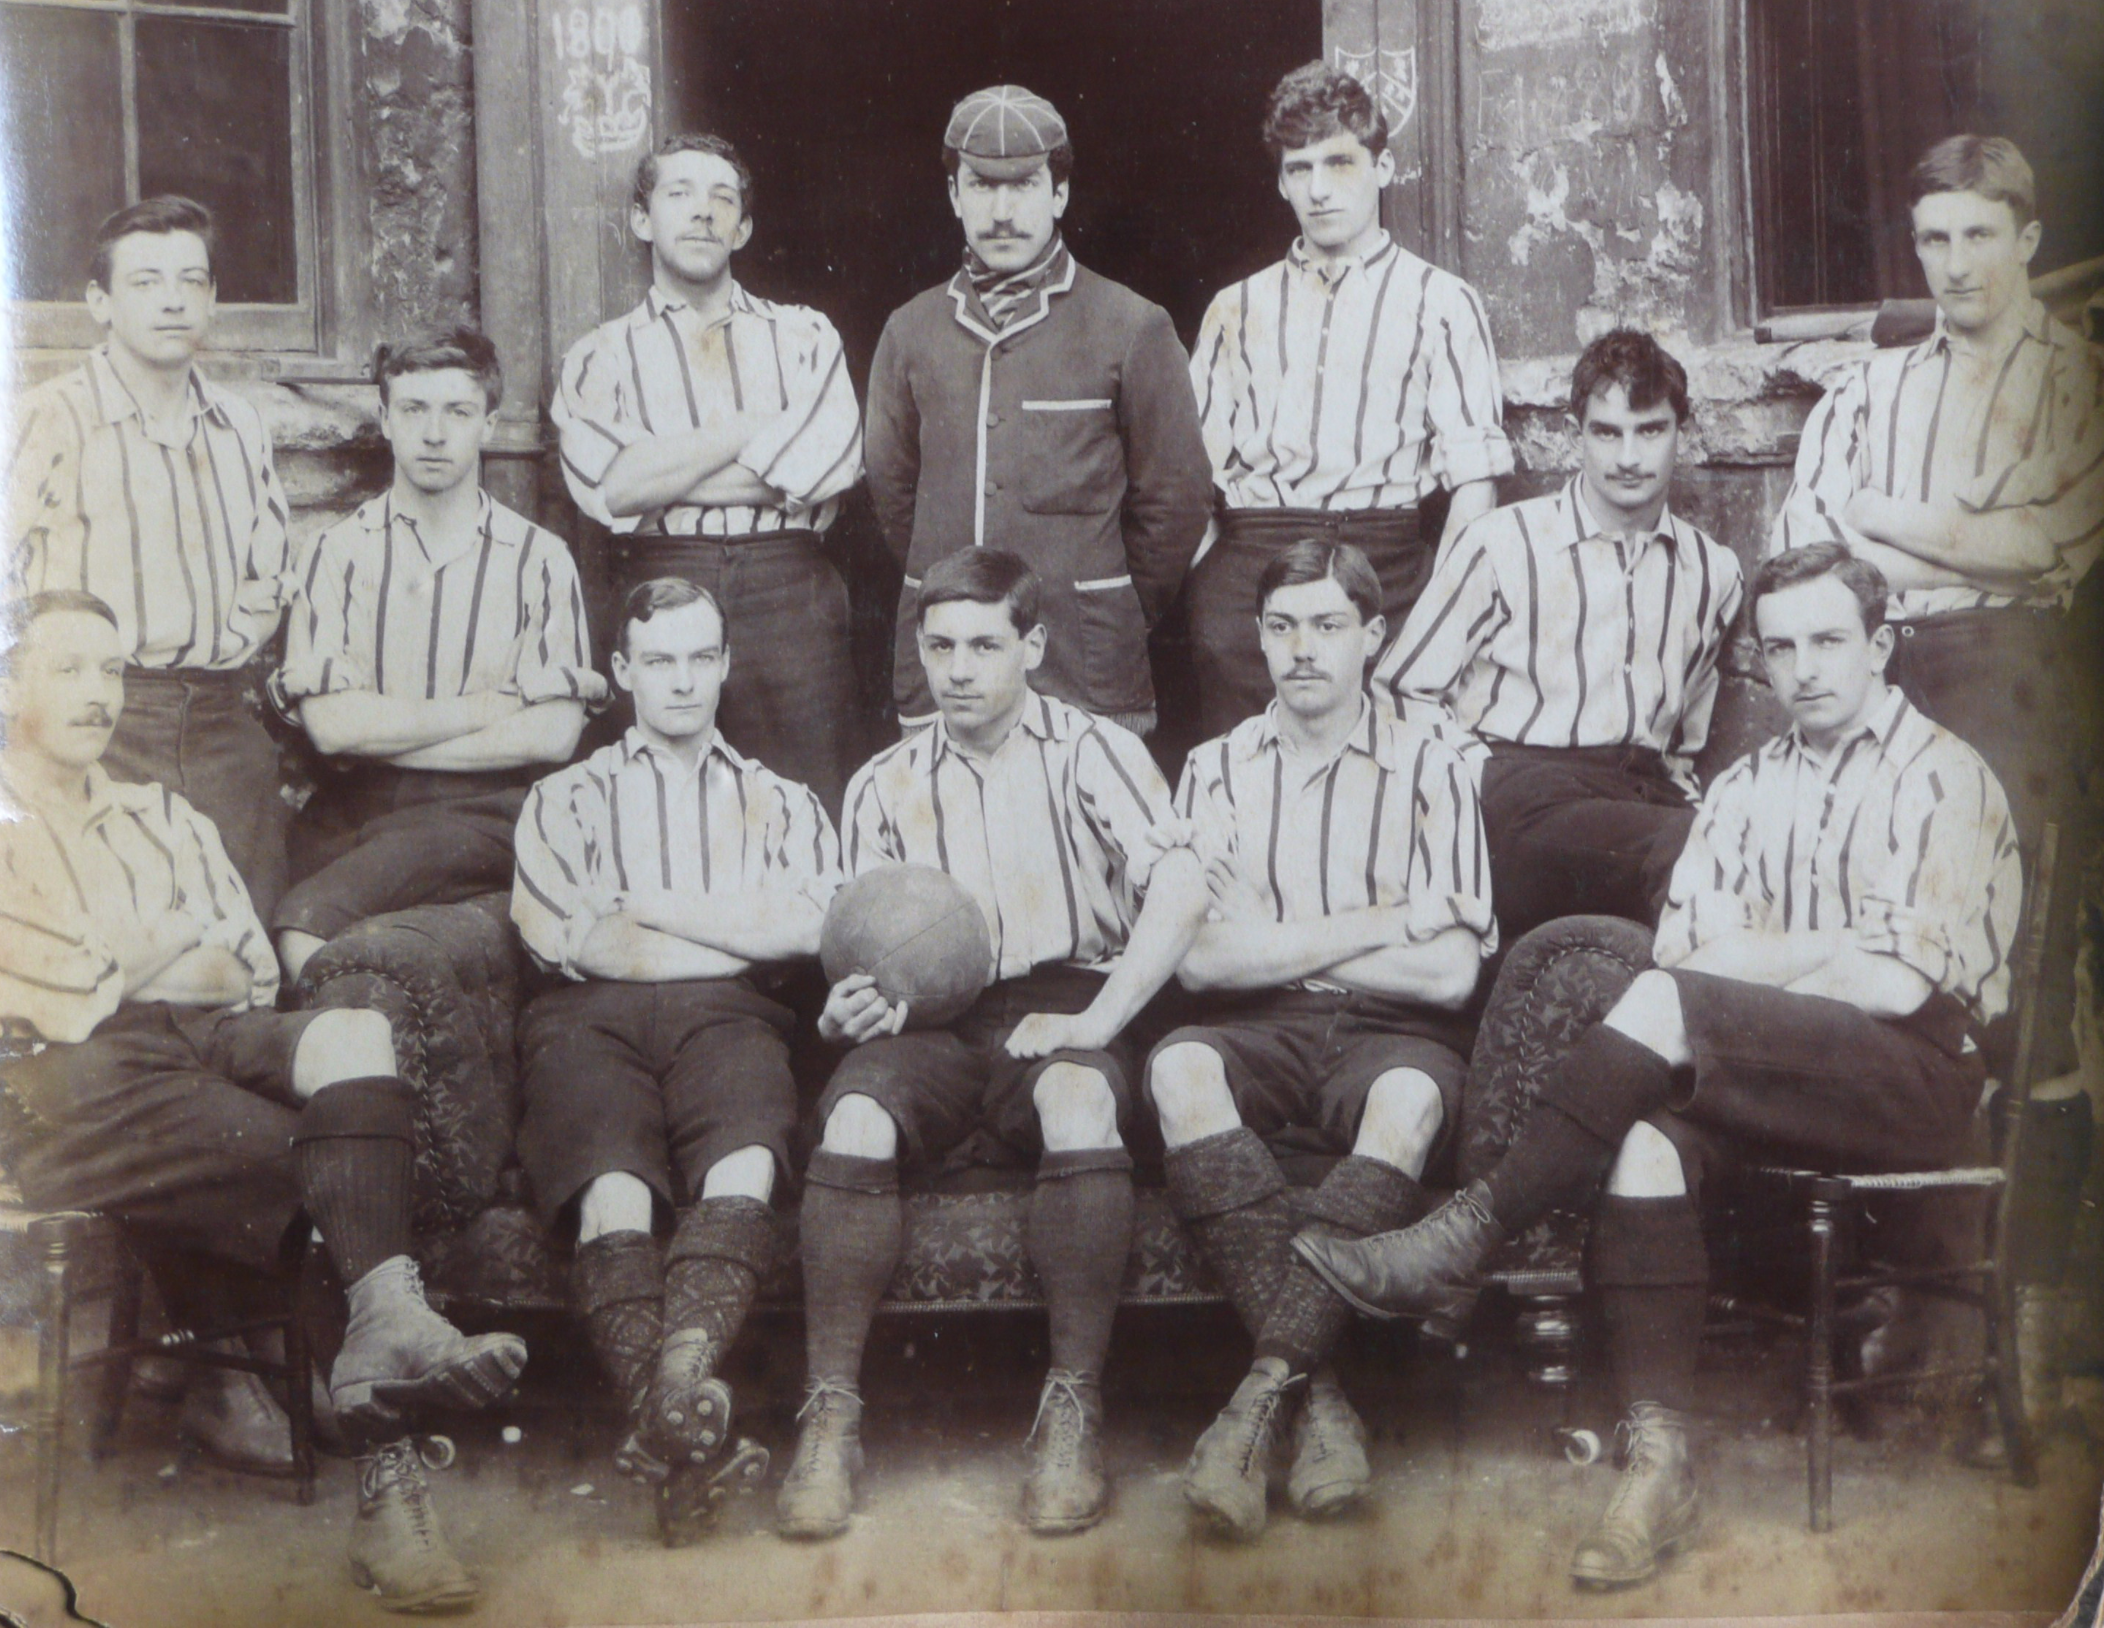 Trinty College, Oxford 1890